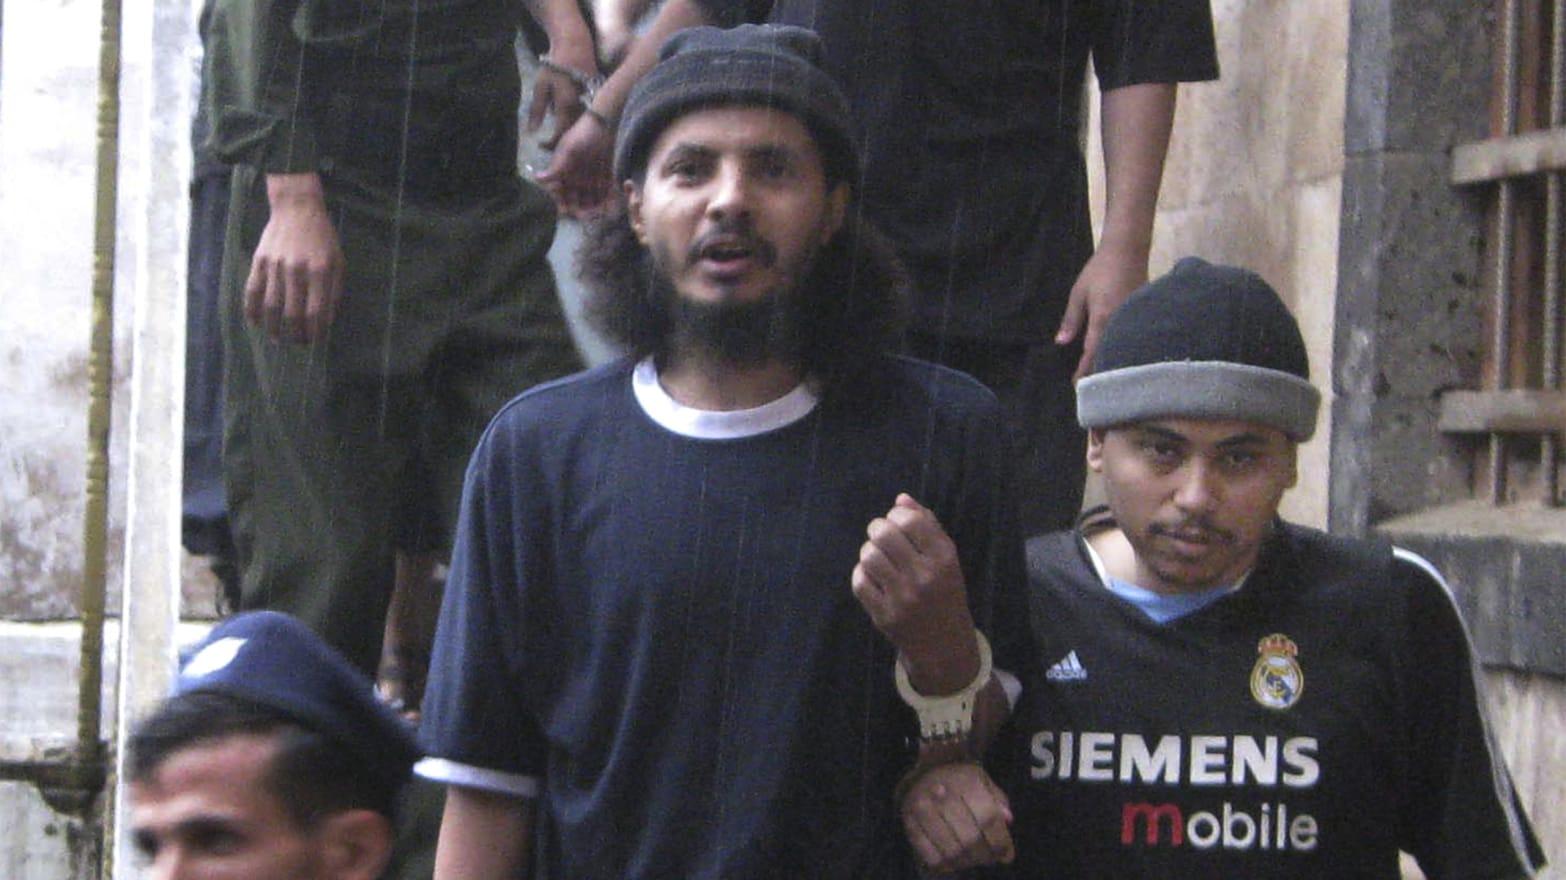 The Al Qaeda Operative in a Brooklyn Court